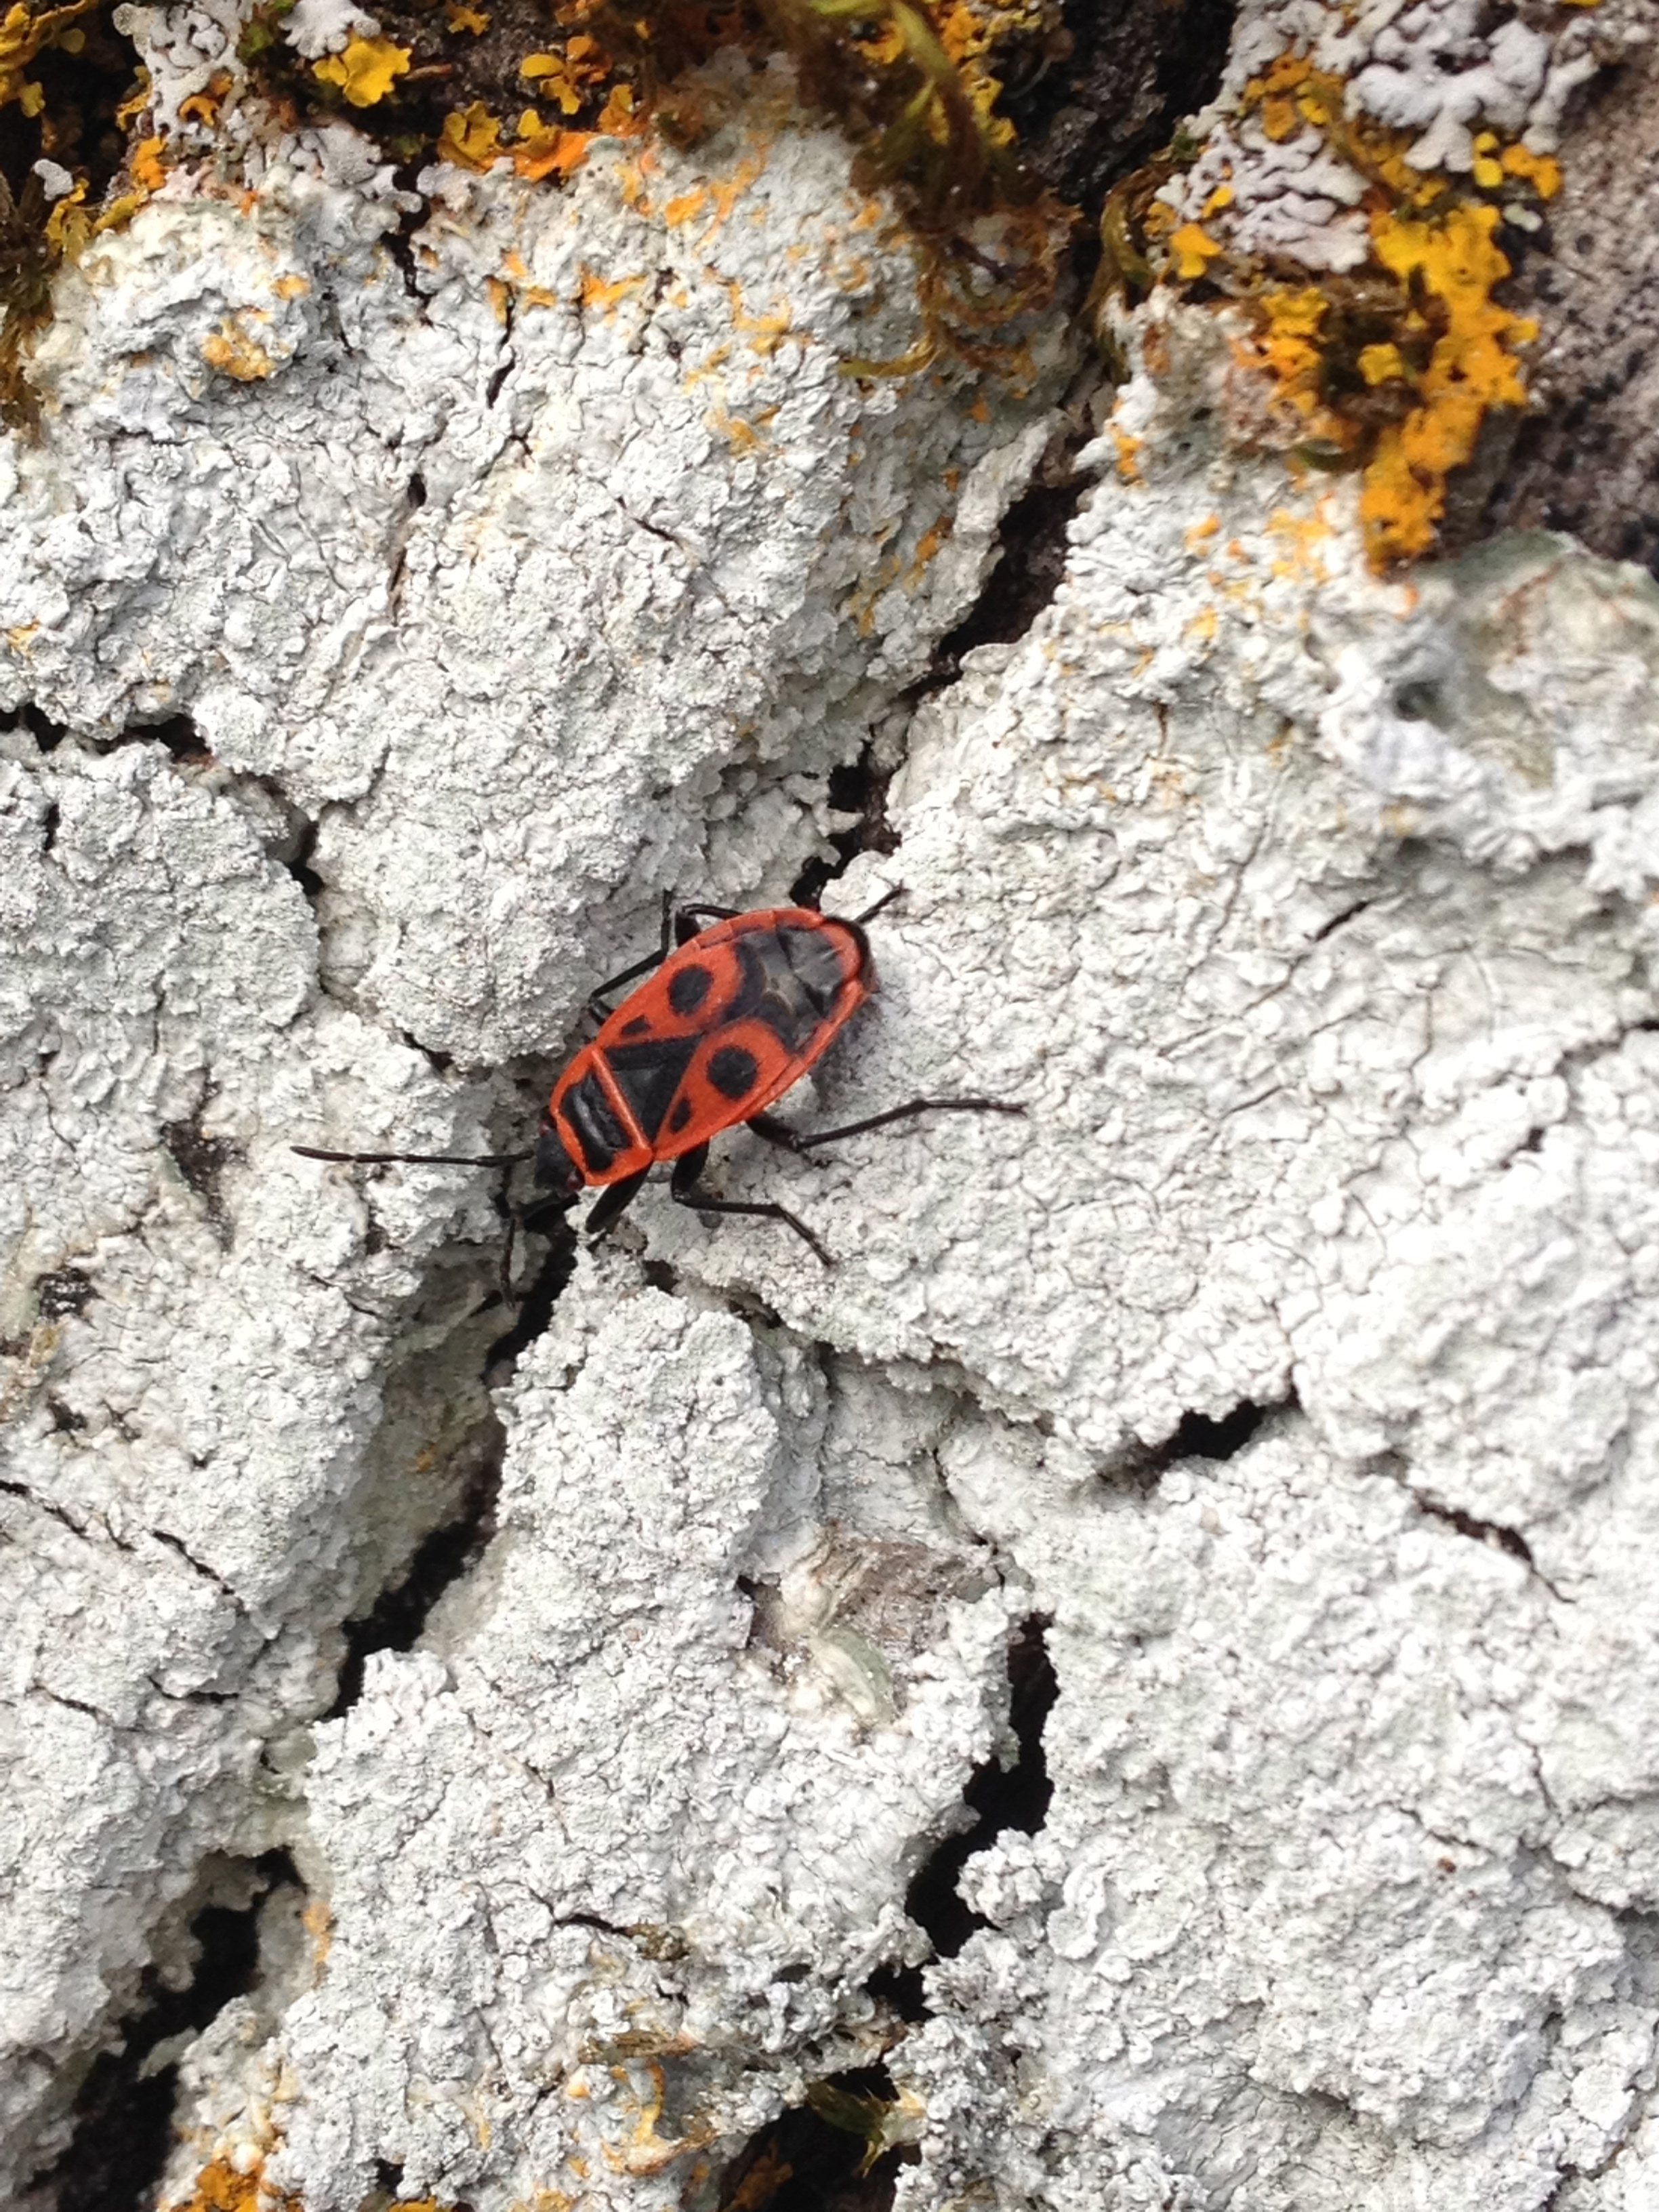 Fire bug ( Pyrrhocoris apterus) in the garden. 21st February 2016.